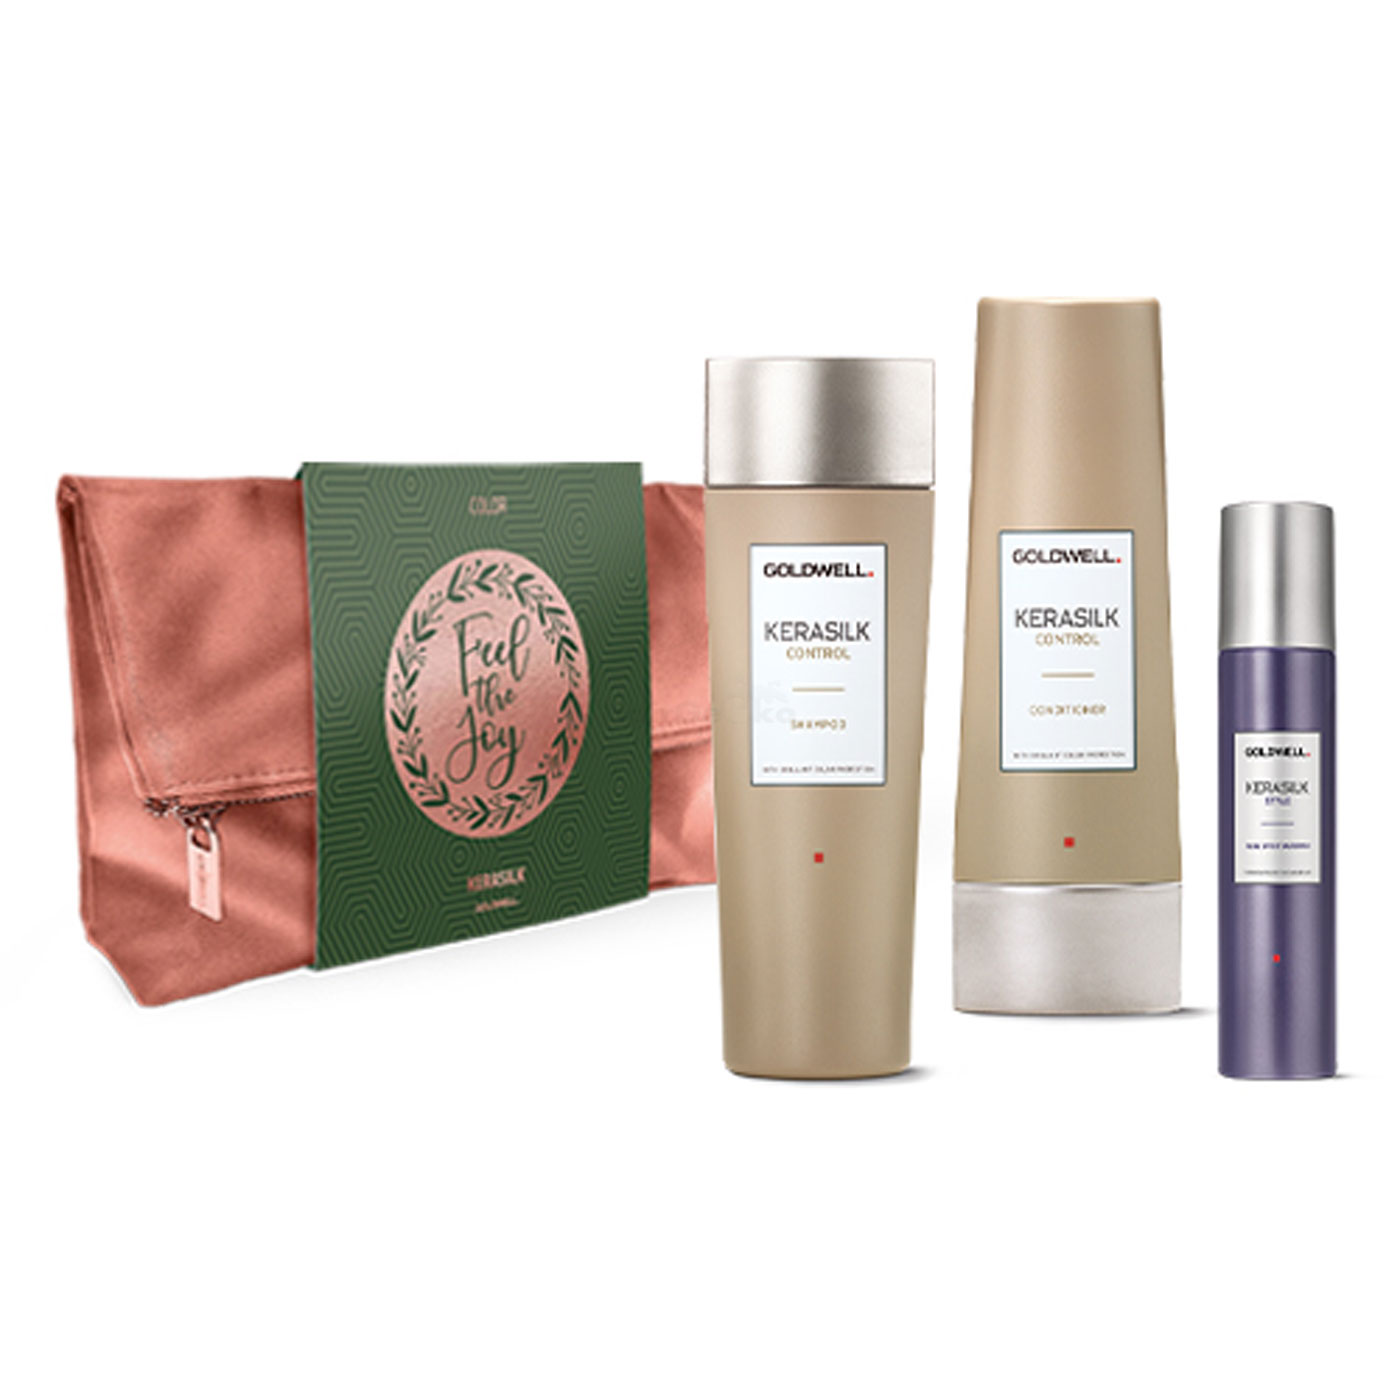 Goldwell Kerasilk Control Xmas Bag Tasche Set - Control Shampoo 250ml + Control Conditioner 200ml + Style Fixing Effect Hairspray 75ml + Tasche